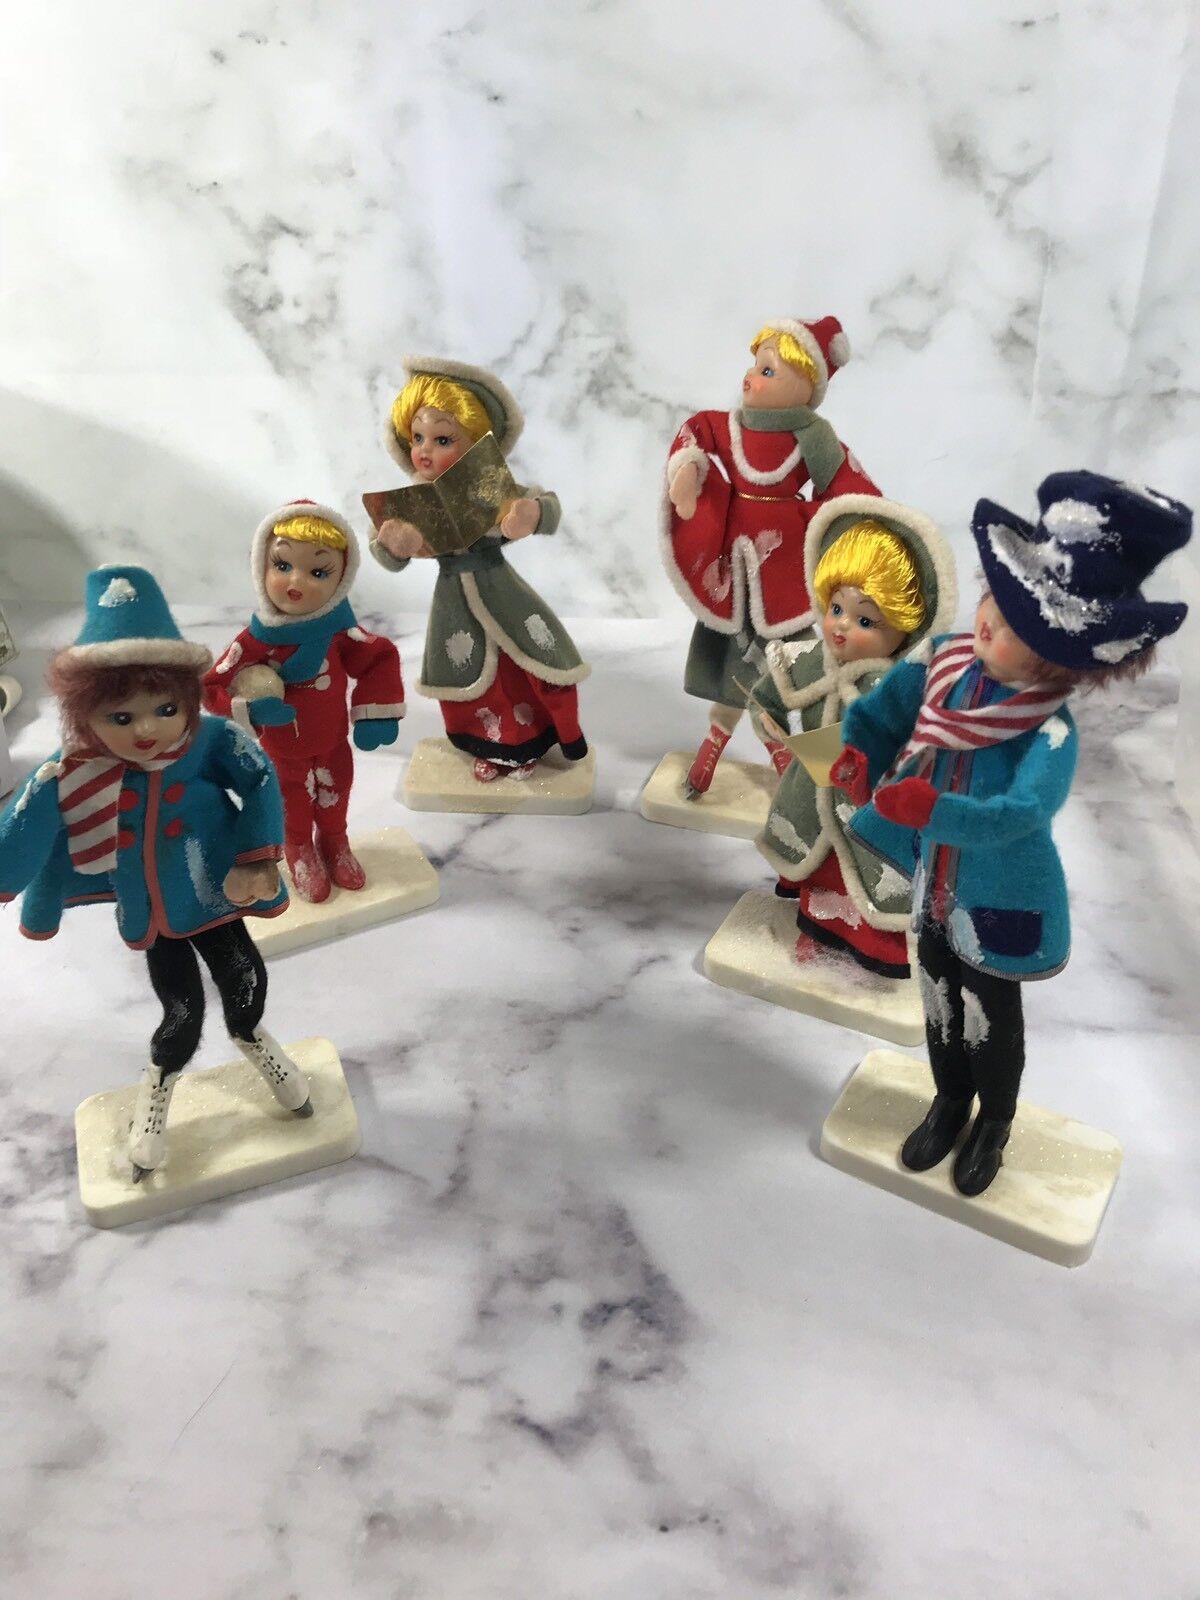 VINTAGE Set of 6 DOLLS on Display Stands Christmas Snow Caroling MADE IN JAPAN